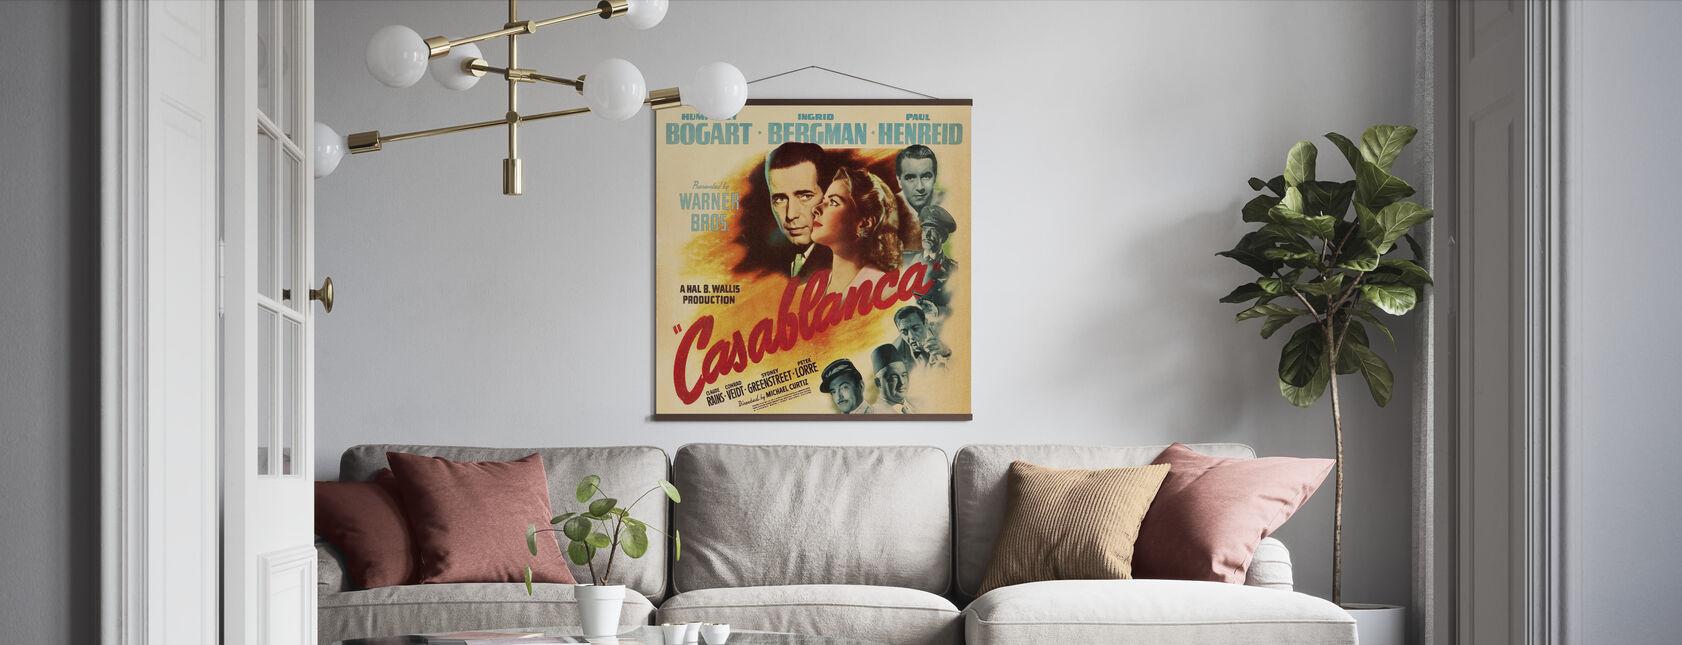 Movie Poster Casablanca - Poster - Living Room